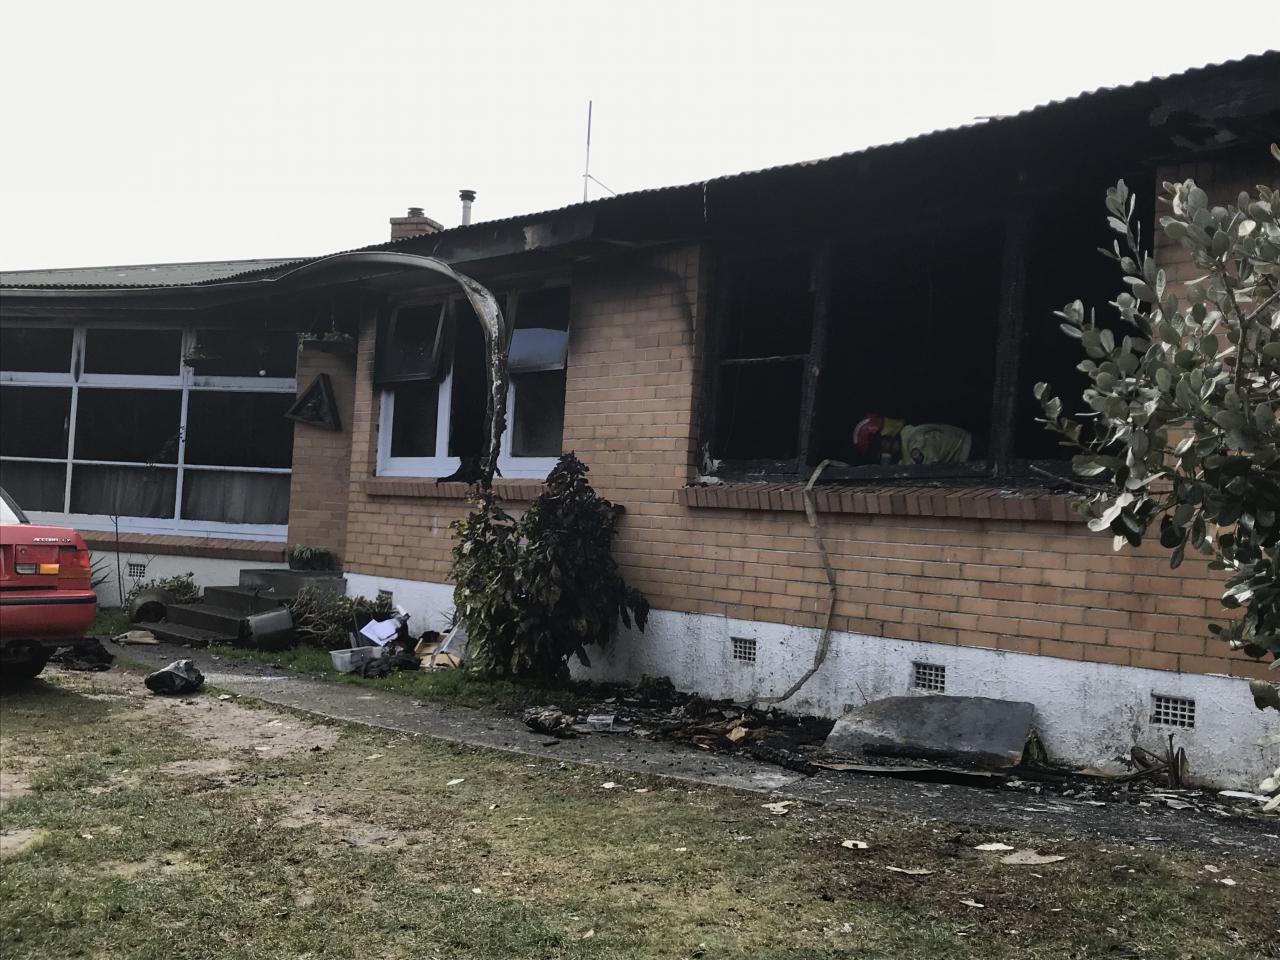 'My son is my hero'; Hamilton mum praises son who alerted family to blaze